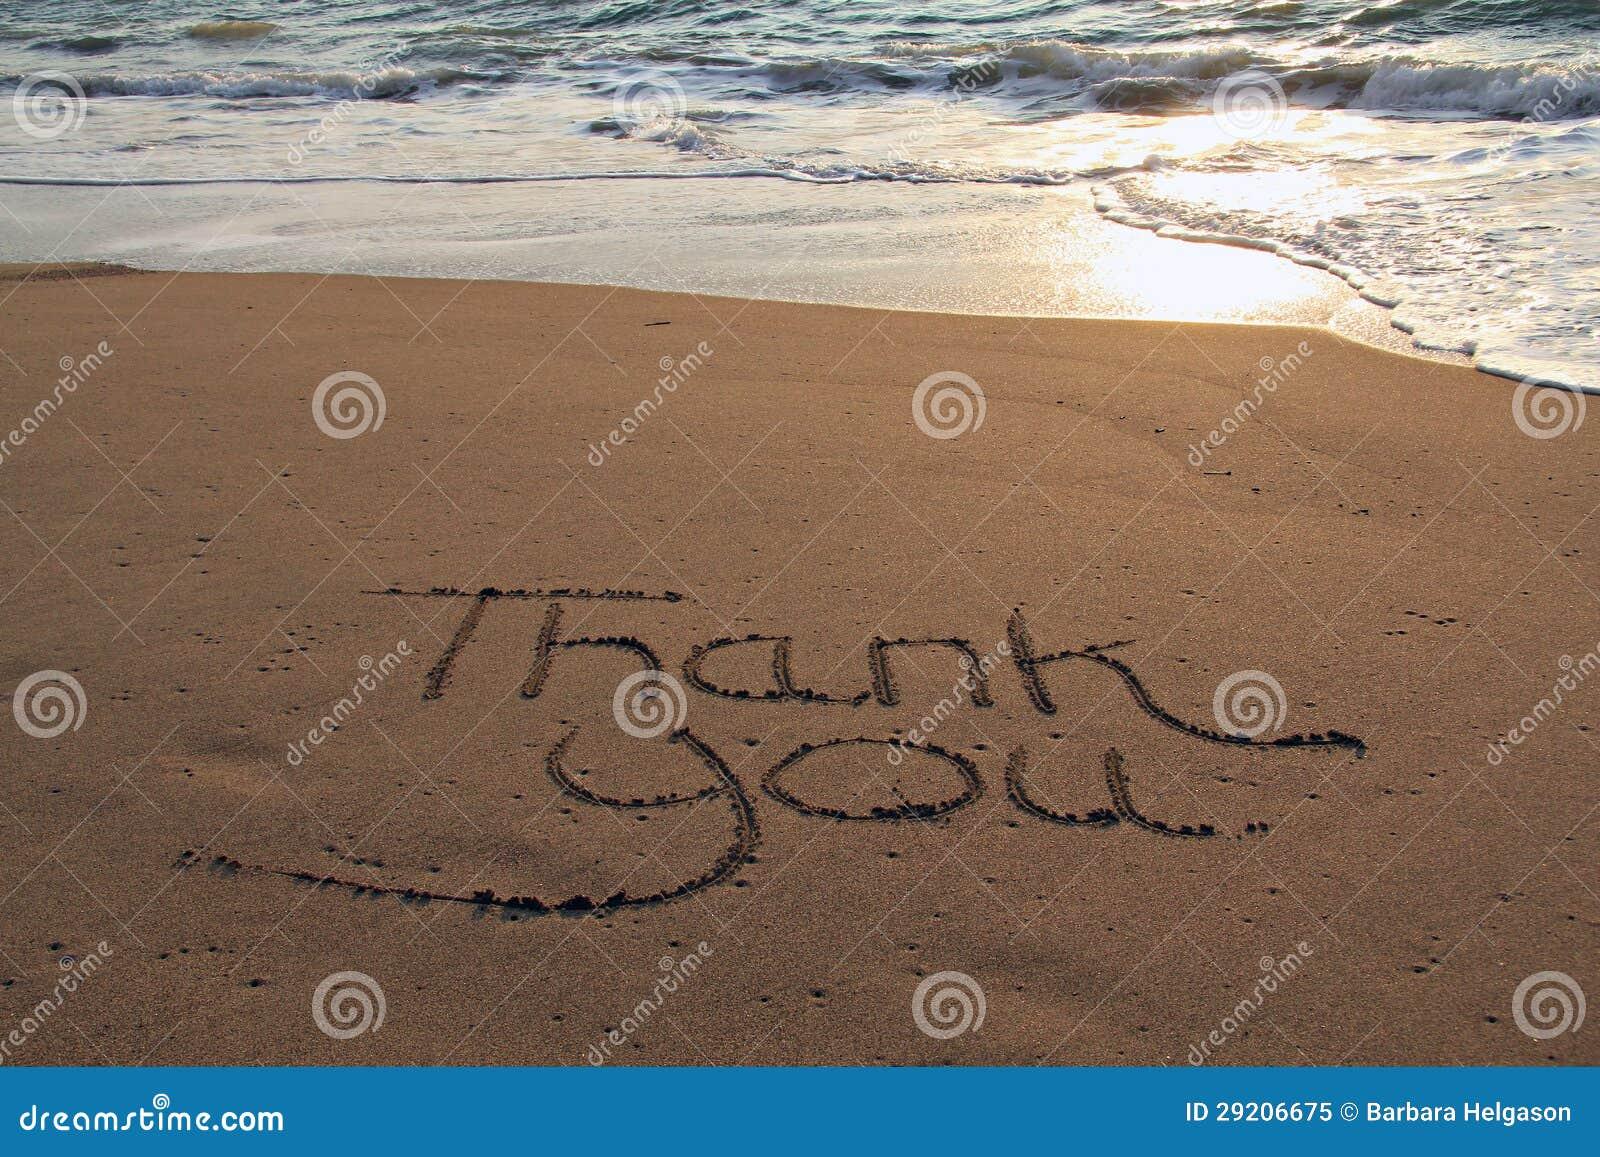 danke auf den strand zu setzen lizenzfreies stockfoto bild 29206675. Black Bedroom Furniture Sets. Home Design Ideas